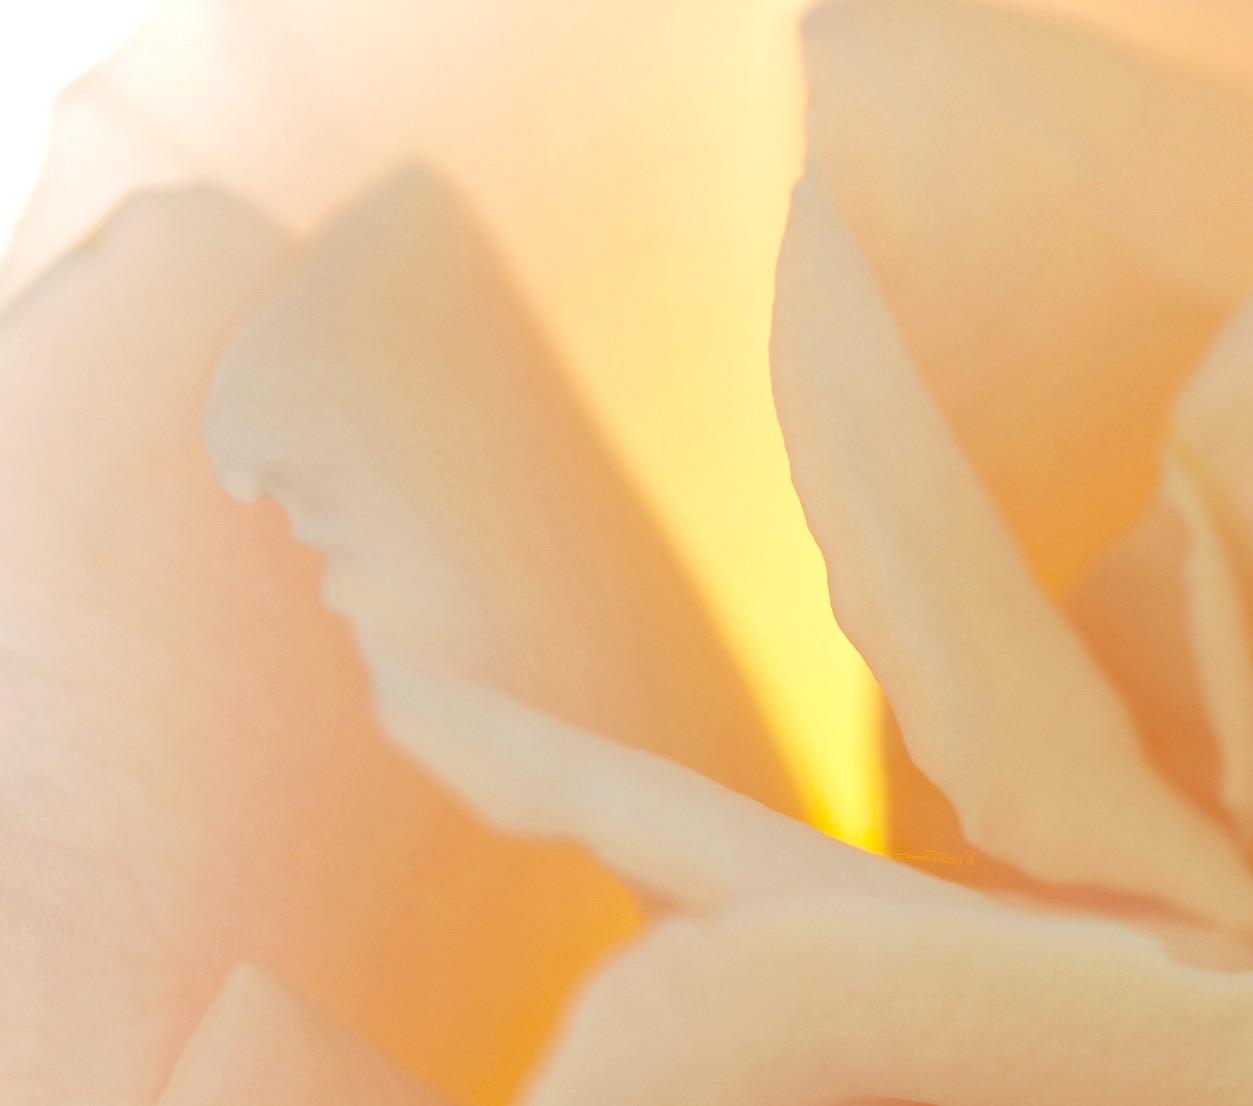 rose photograph, creativity expression in art, debiriley.com